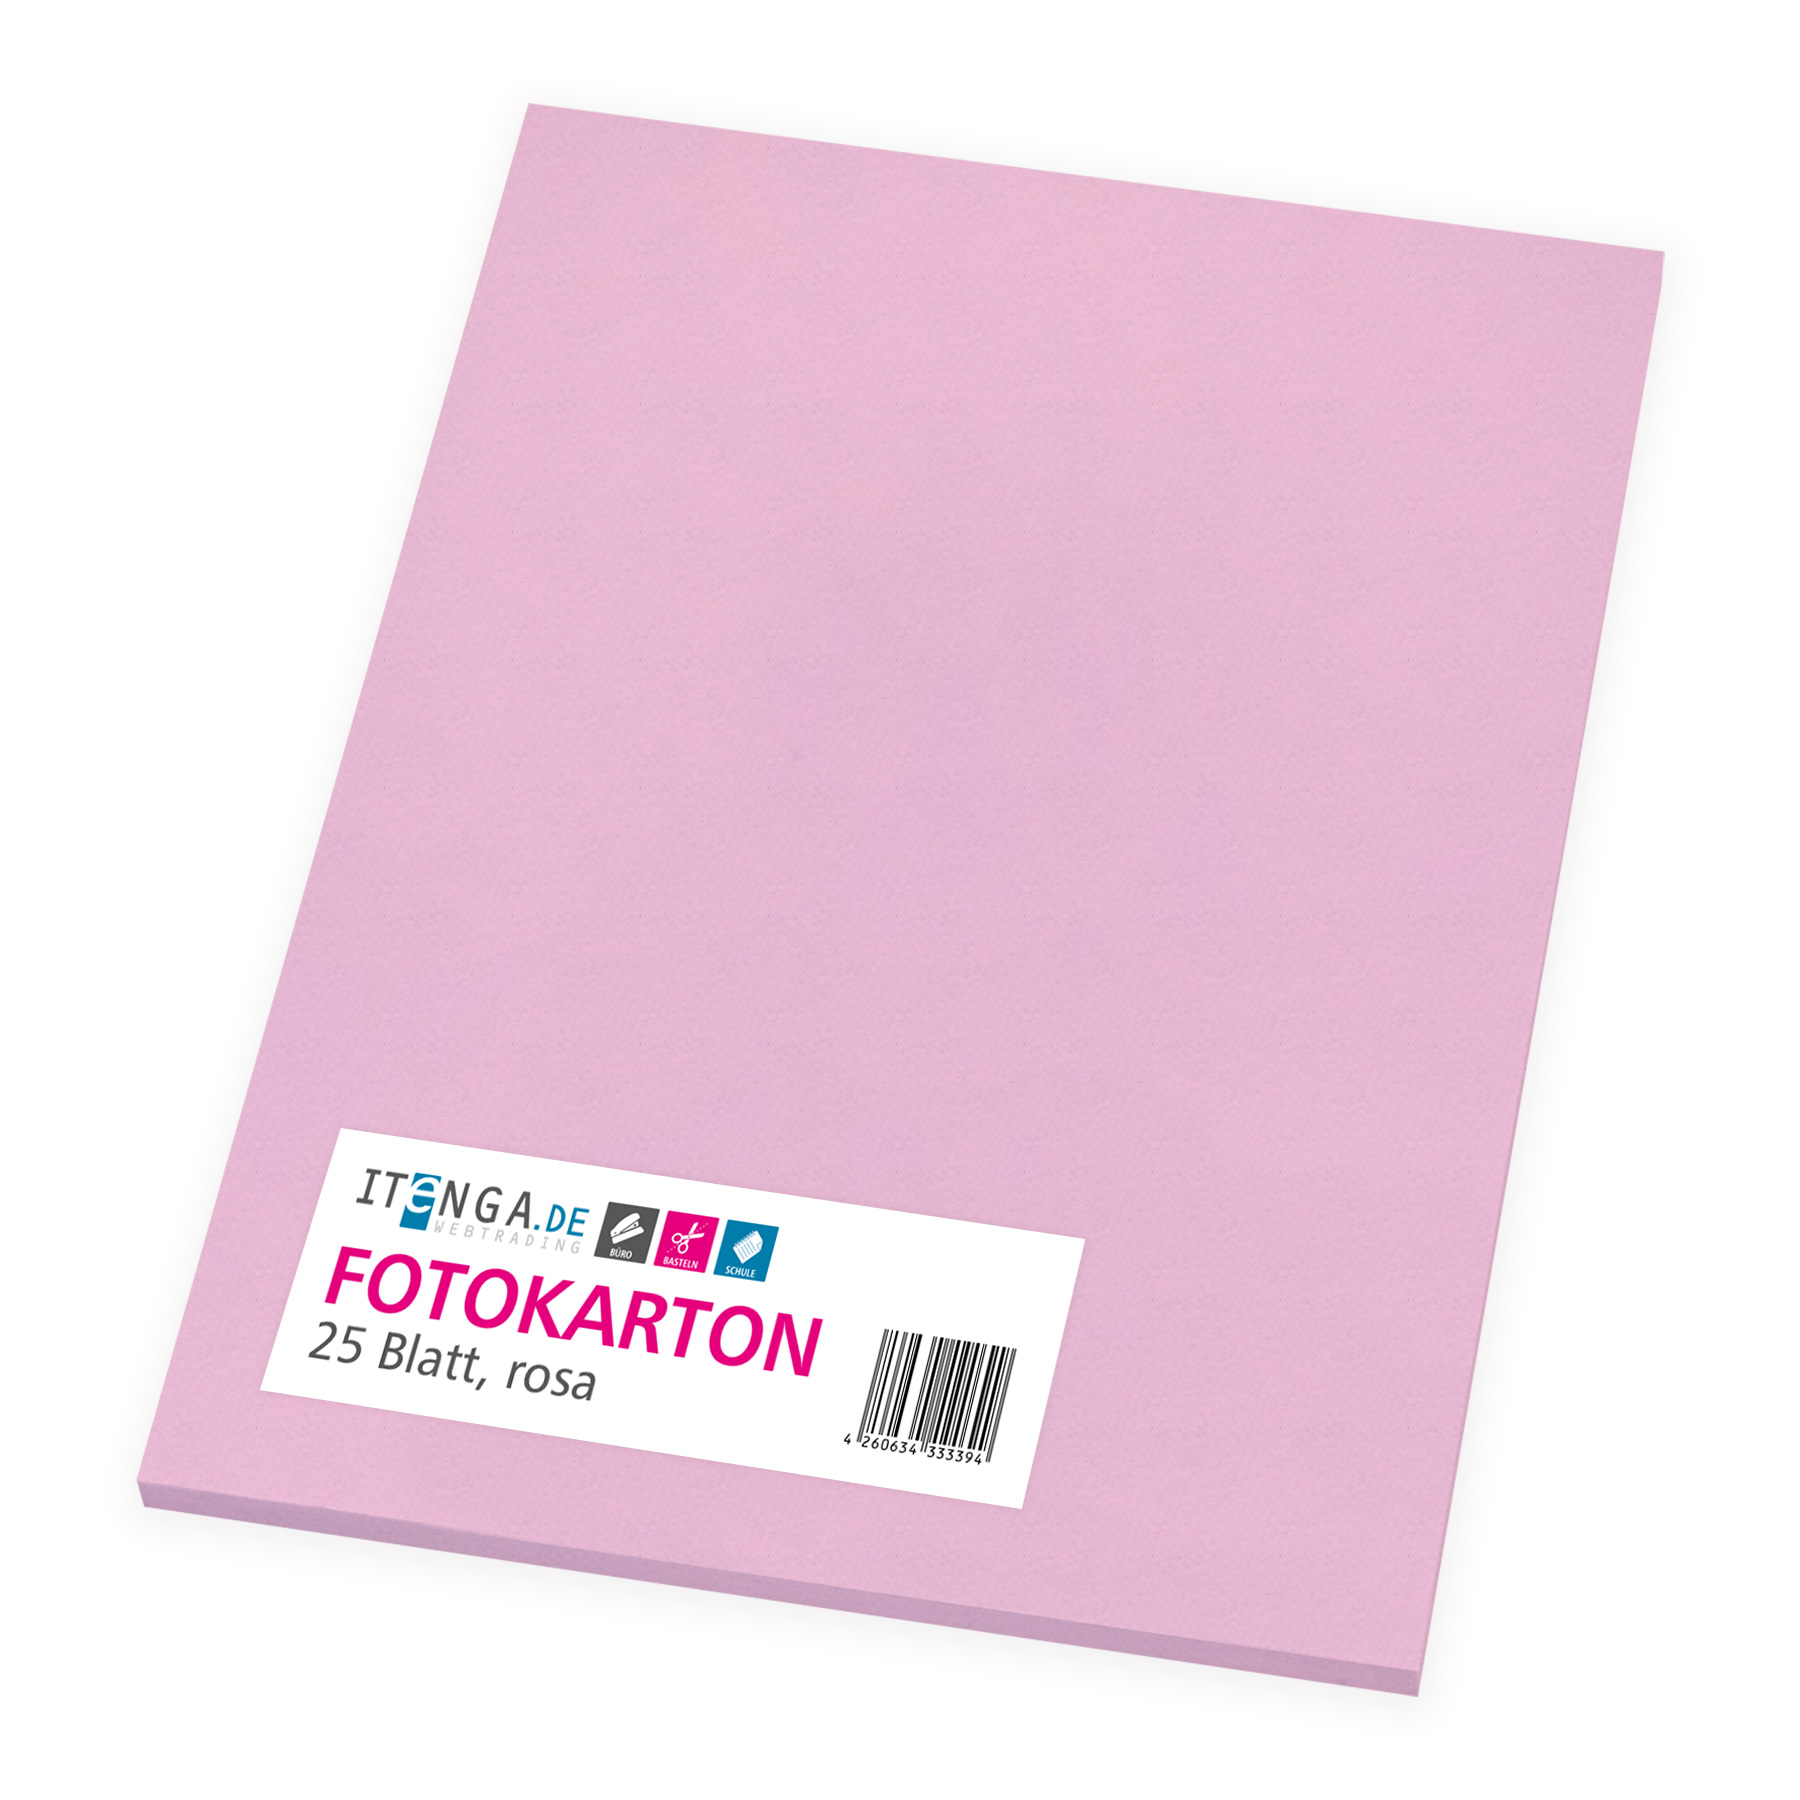 itenga Fotokarton - A4 300 g/qm rosa 25 Blatt